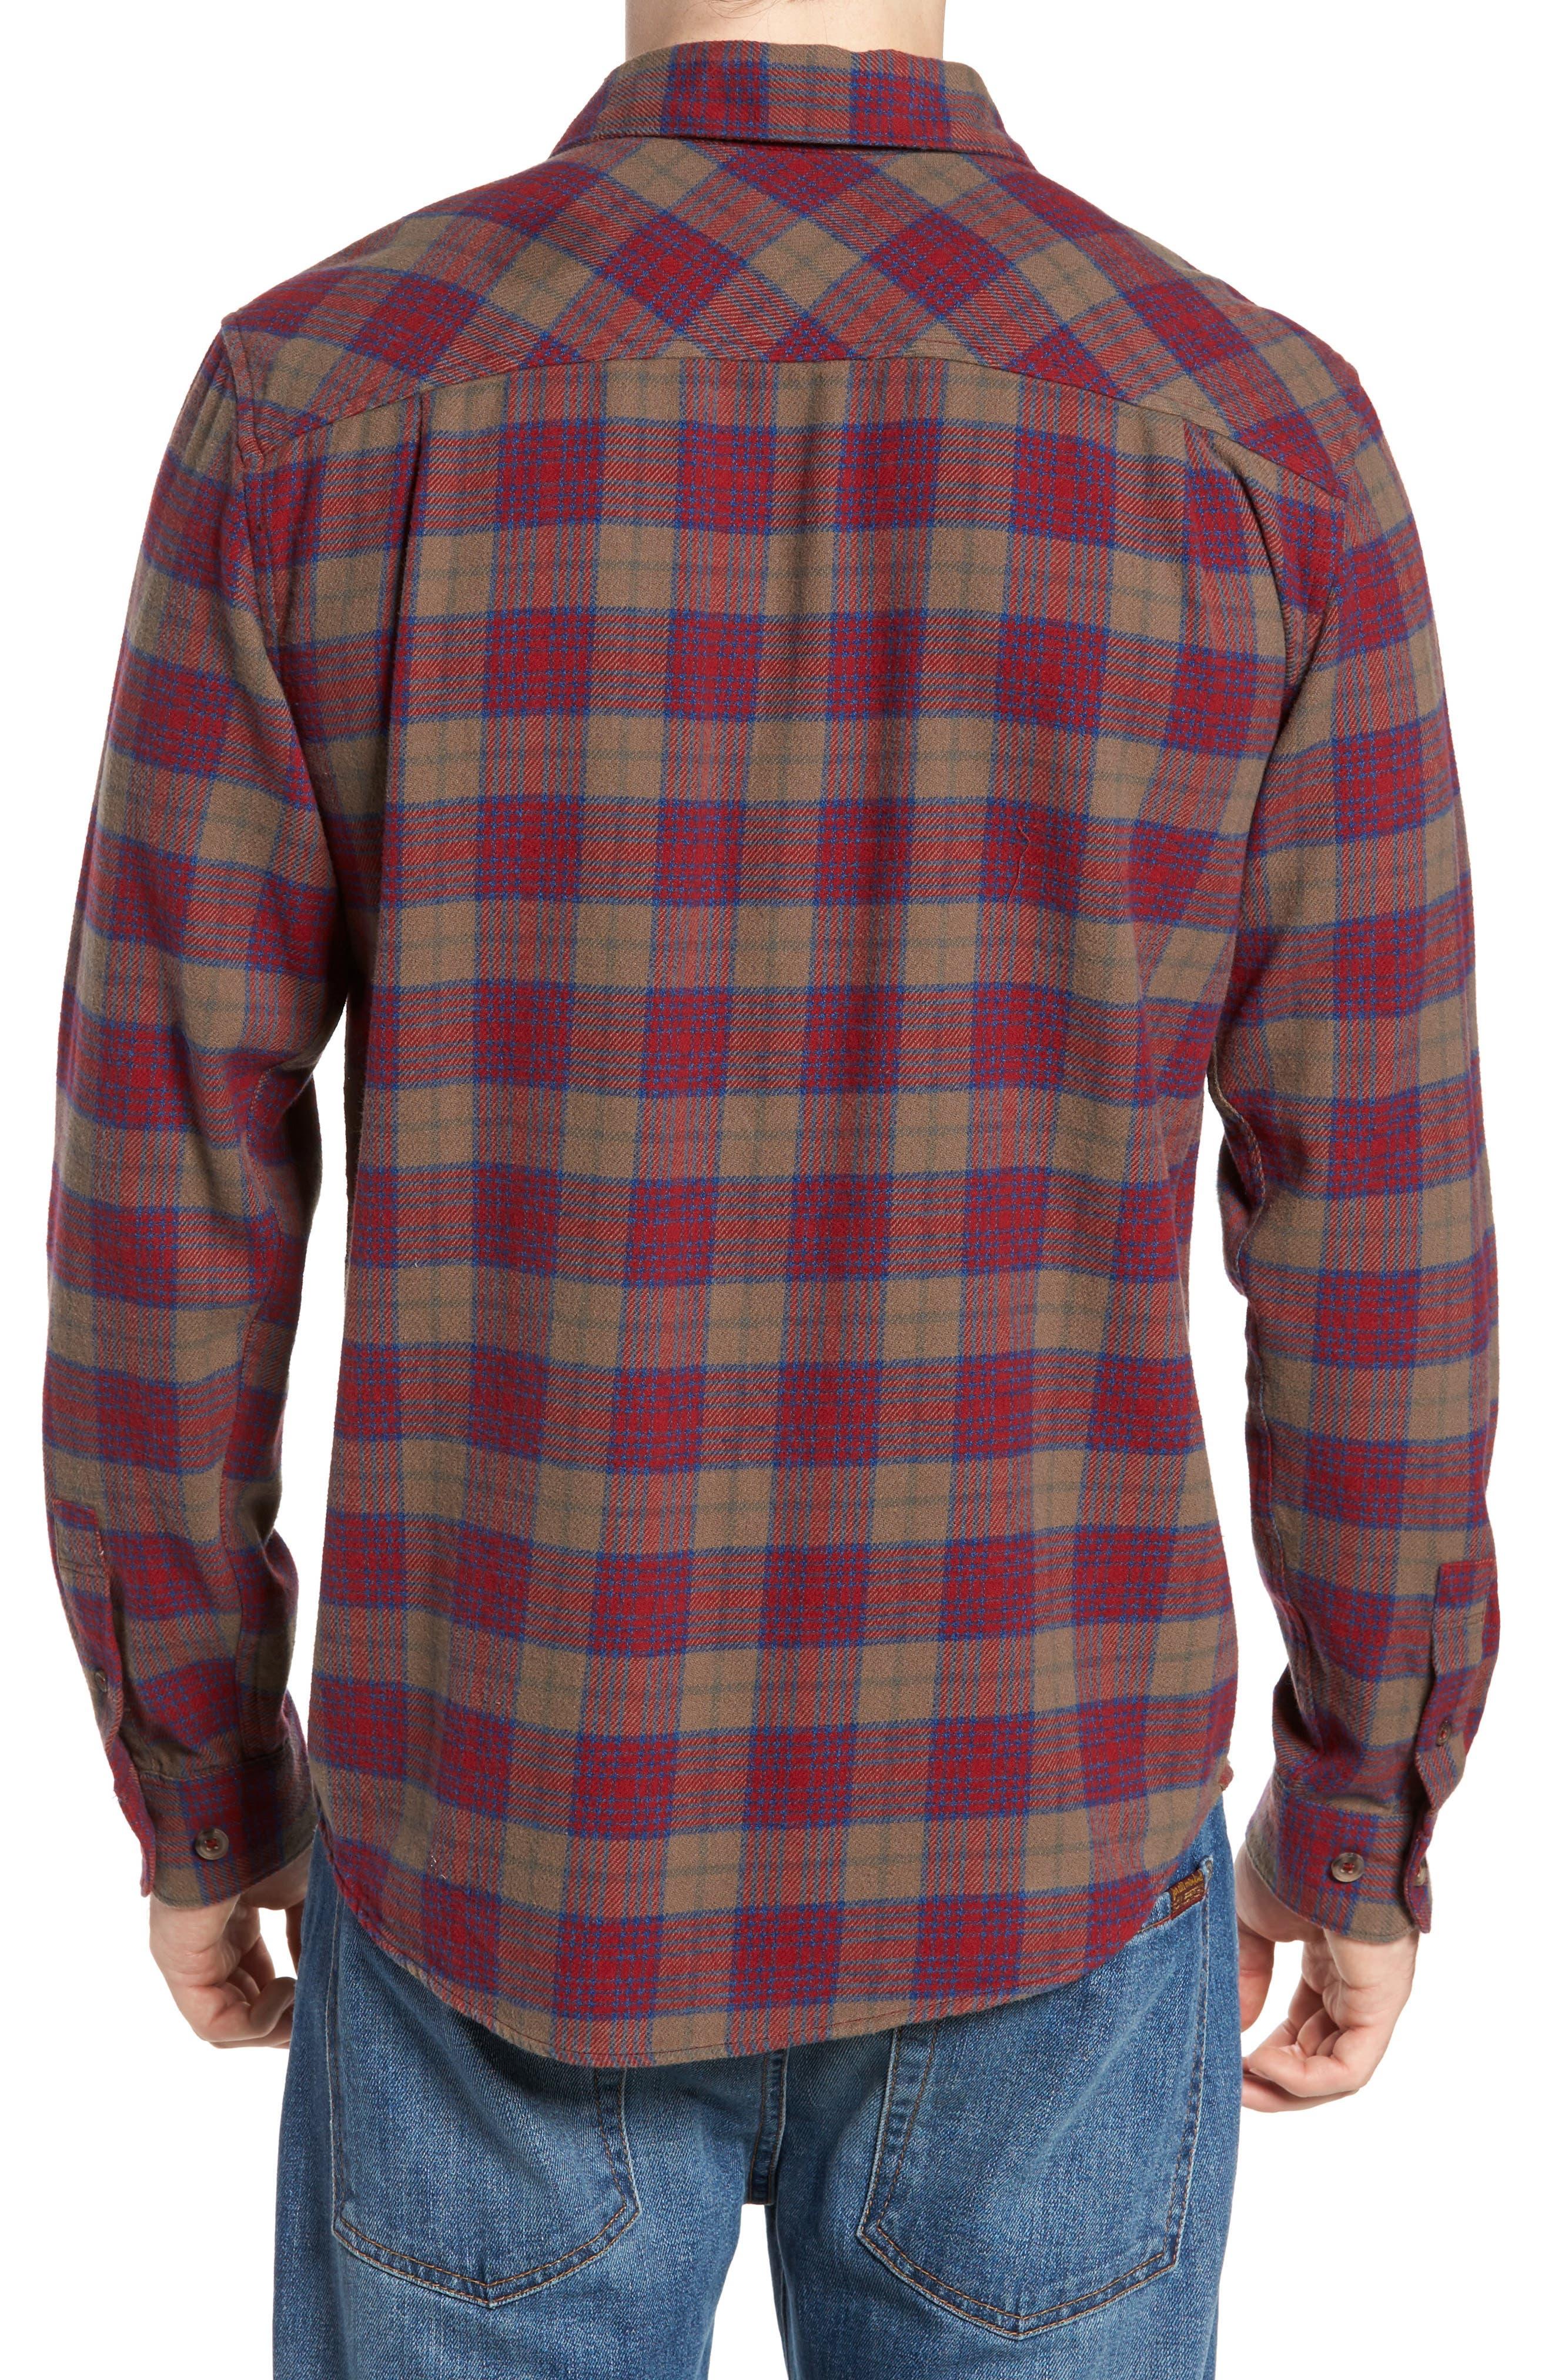 'That'll Work' Trim Fit Plaid Flannel Shirt,                             Alternate thumbnail 8, color,